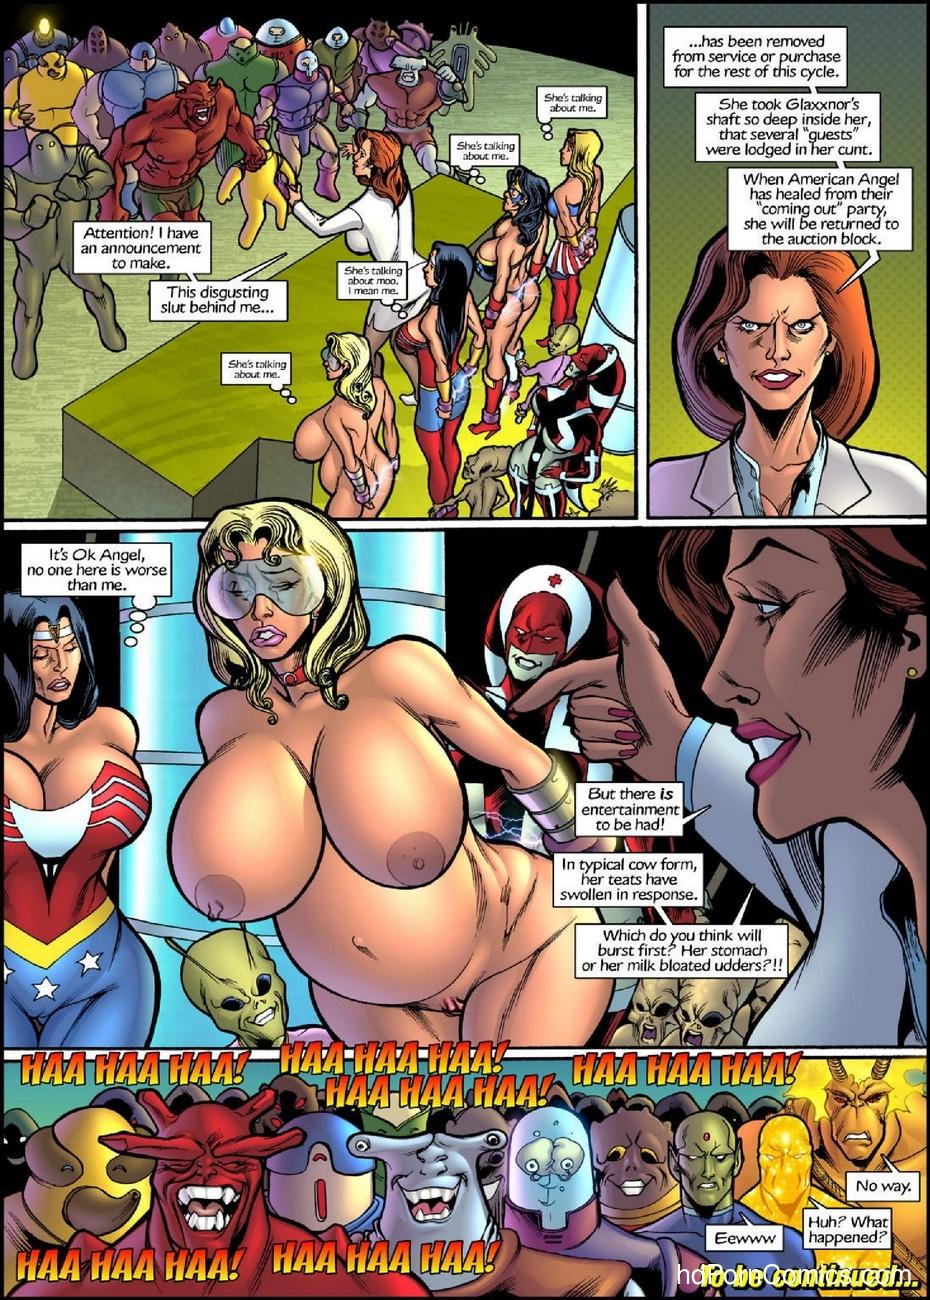 Freedom Stars - Cattle Call 1 32 free sex comic